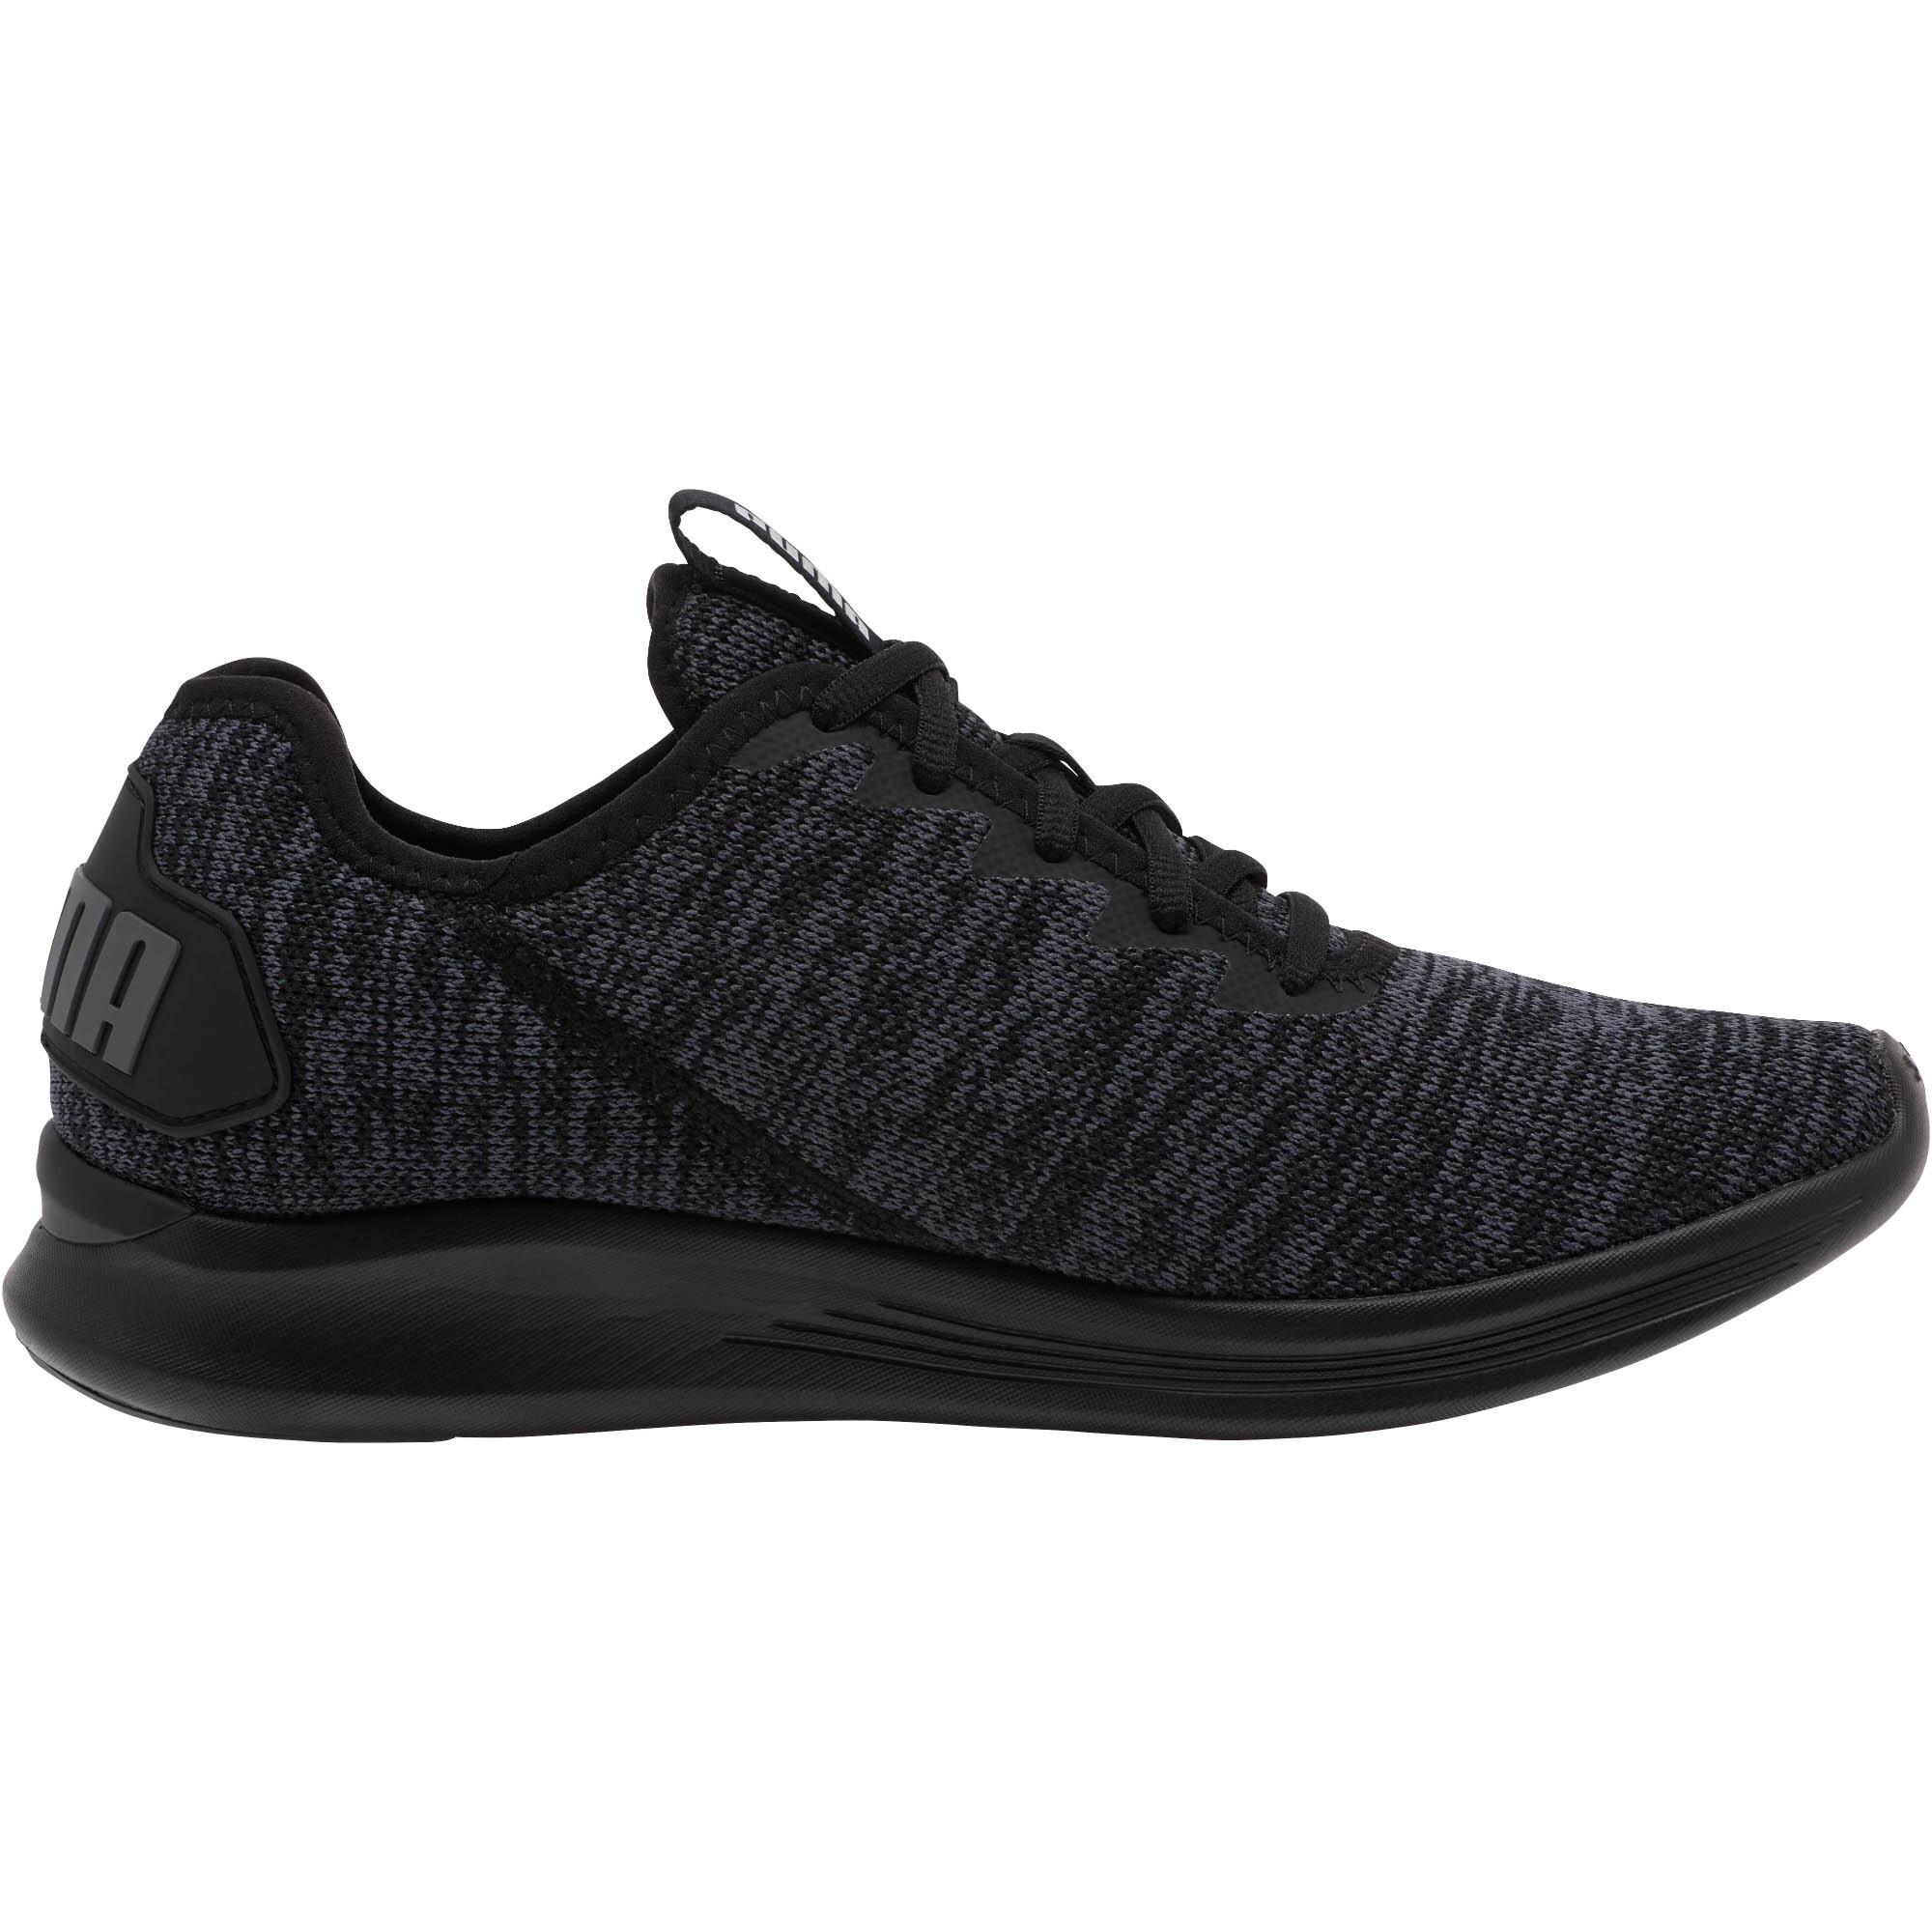 PUMA-Ballast-Men-039-s-Running-Shoes-Men-Shoe-Running thumbnail 17